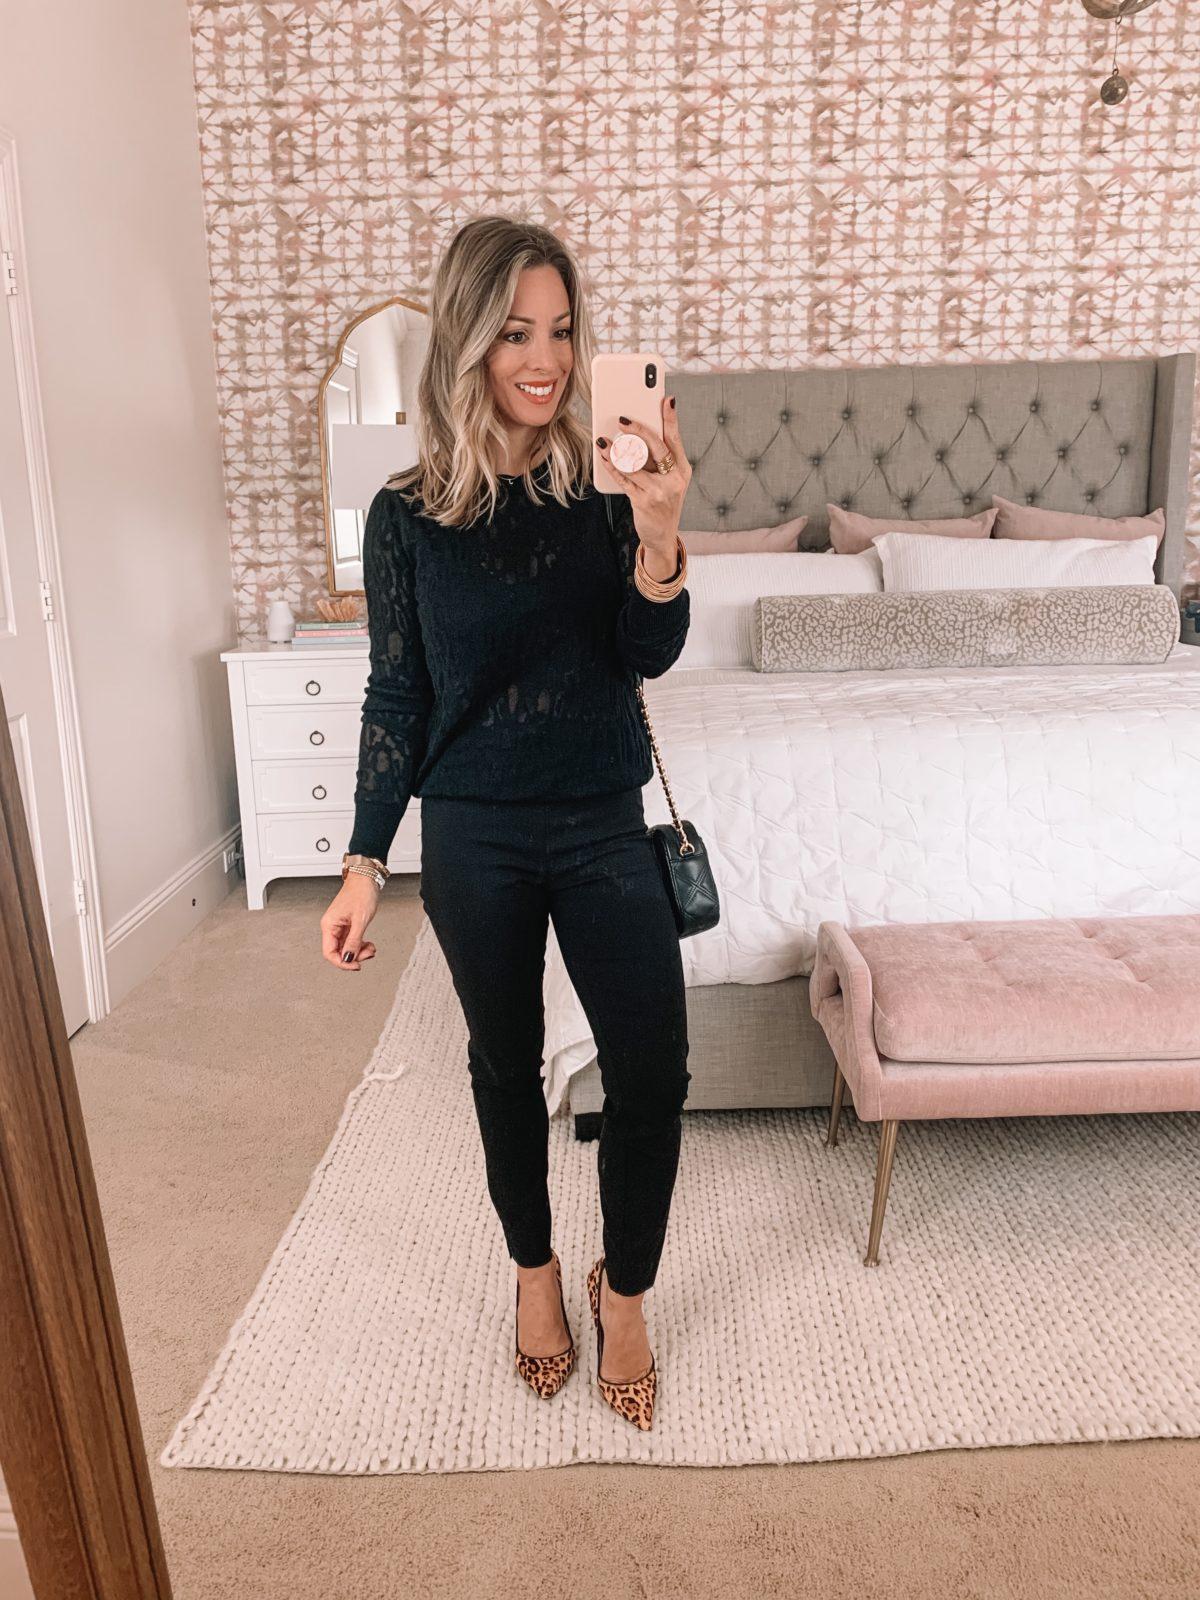 Dressing Room Finds Nordstrom, Sweater, Black Pants, Leopard Heels, Crossbody